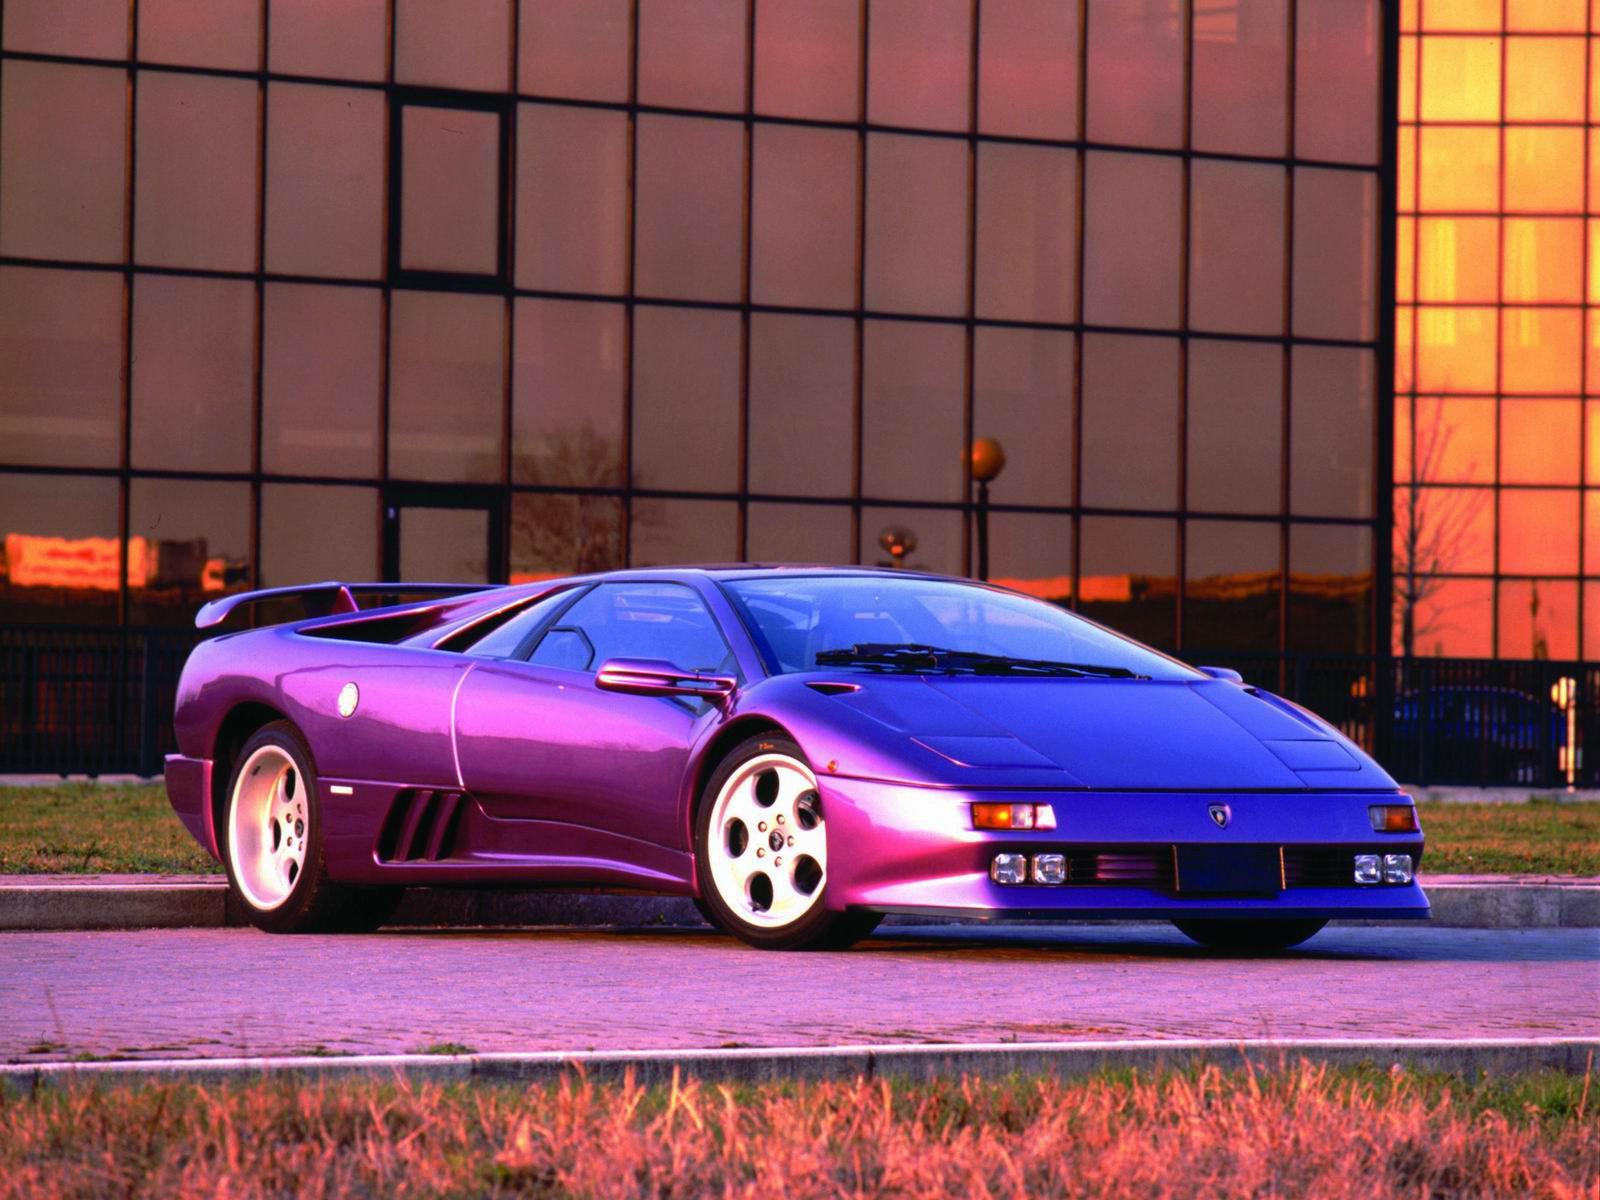 Lamborghini Diablo Se30 Photos Photogallery With 7 Pics